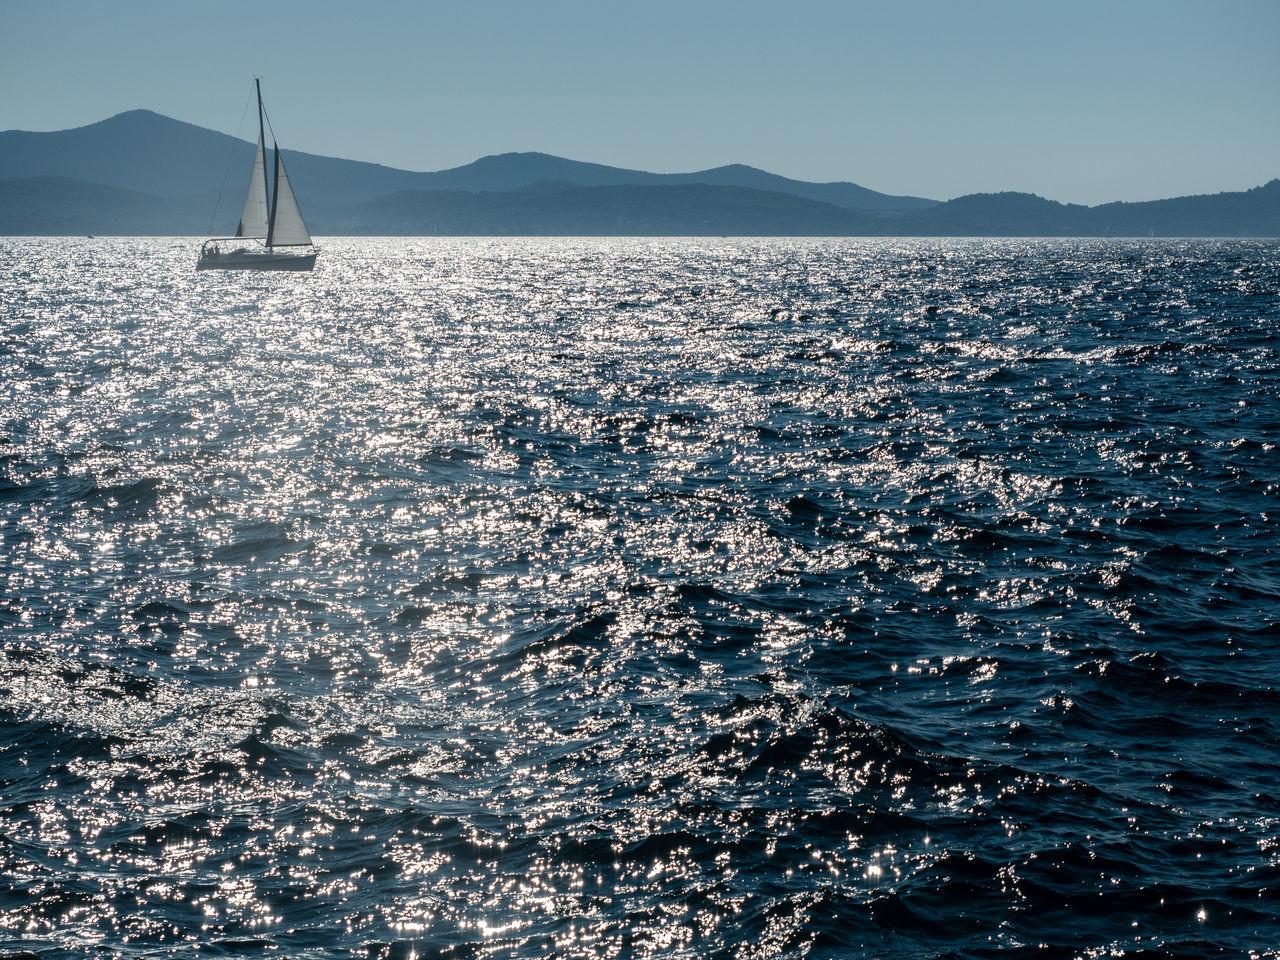 Blue Coast Coastline Croatia Mast Mountain Nautical Vessel Open Space Outdoors Reflection Sailboat Sailing Sailing Ship Sailing Ship Sea Sea And Sky Summer Sunlight Vacations Water Yacht Yachting Zadar